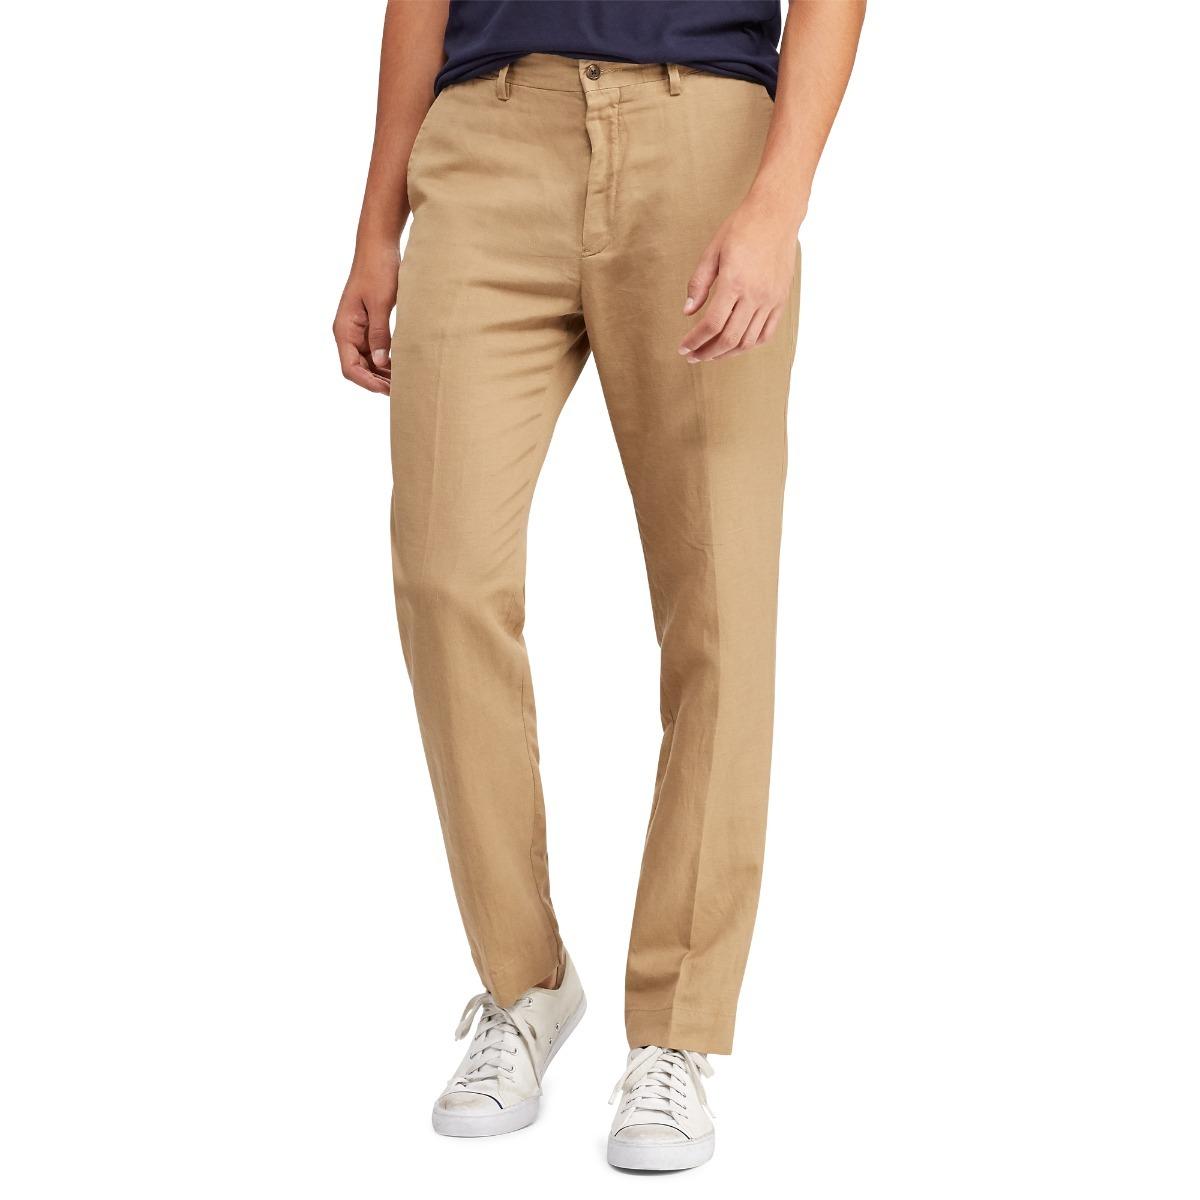 calça masculina de sarja polo ralph lauren original. Carregando zoom. 830b33201d5